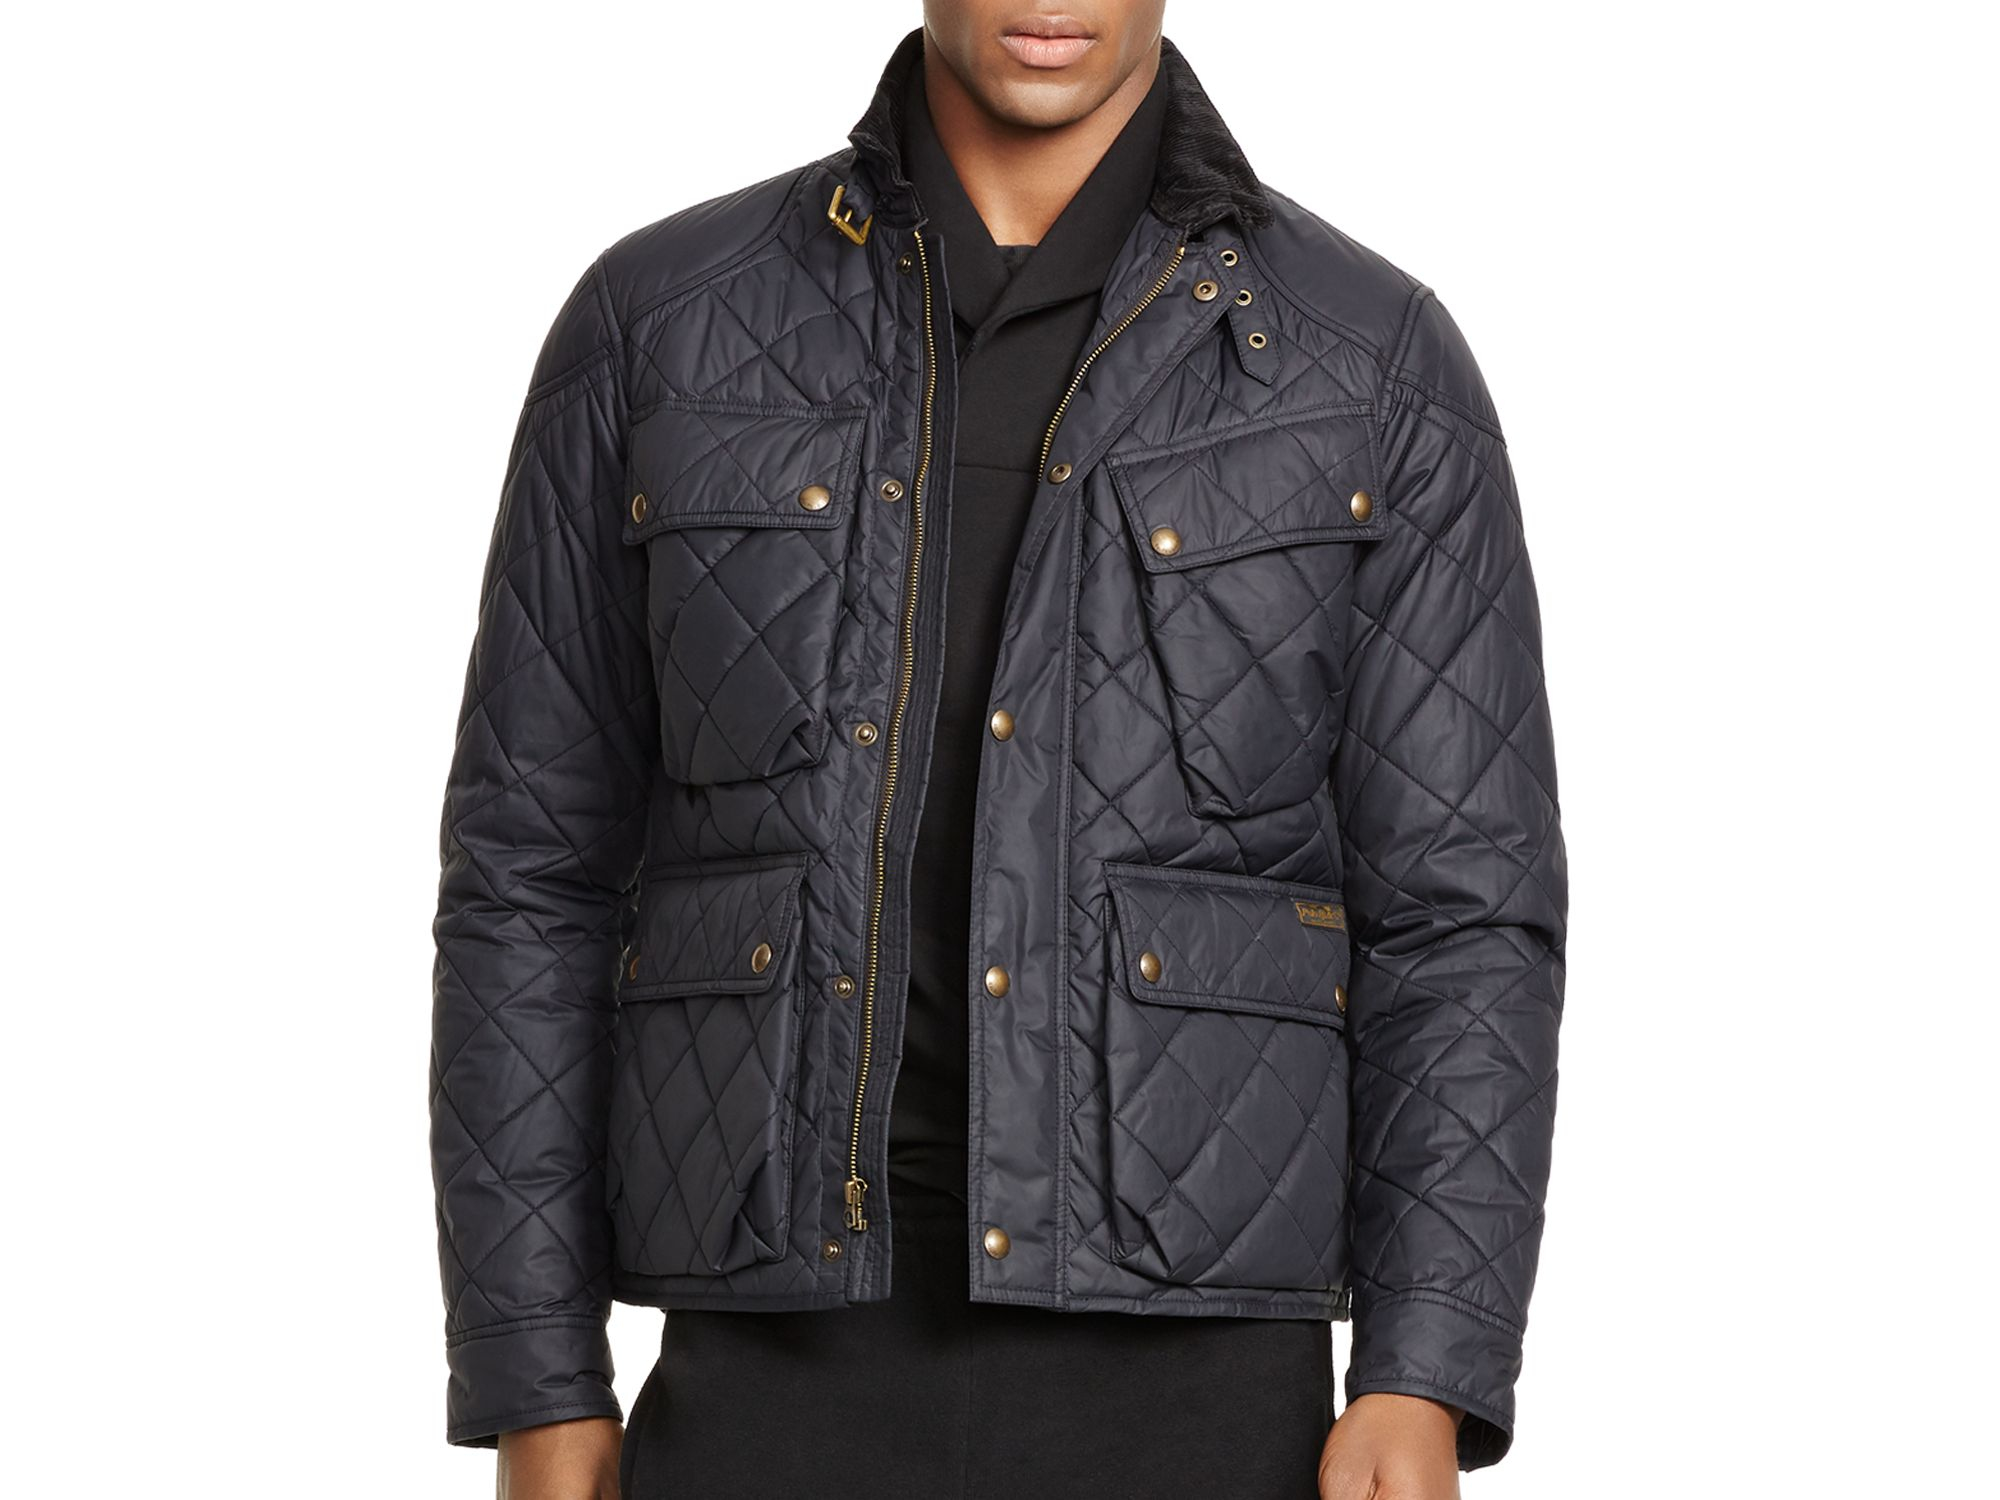 Ralph lauren Polo Quilted Bike Jacket in Black for Men | Lyst : ralph lauren jacket quilted - Adamdwight.com